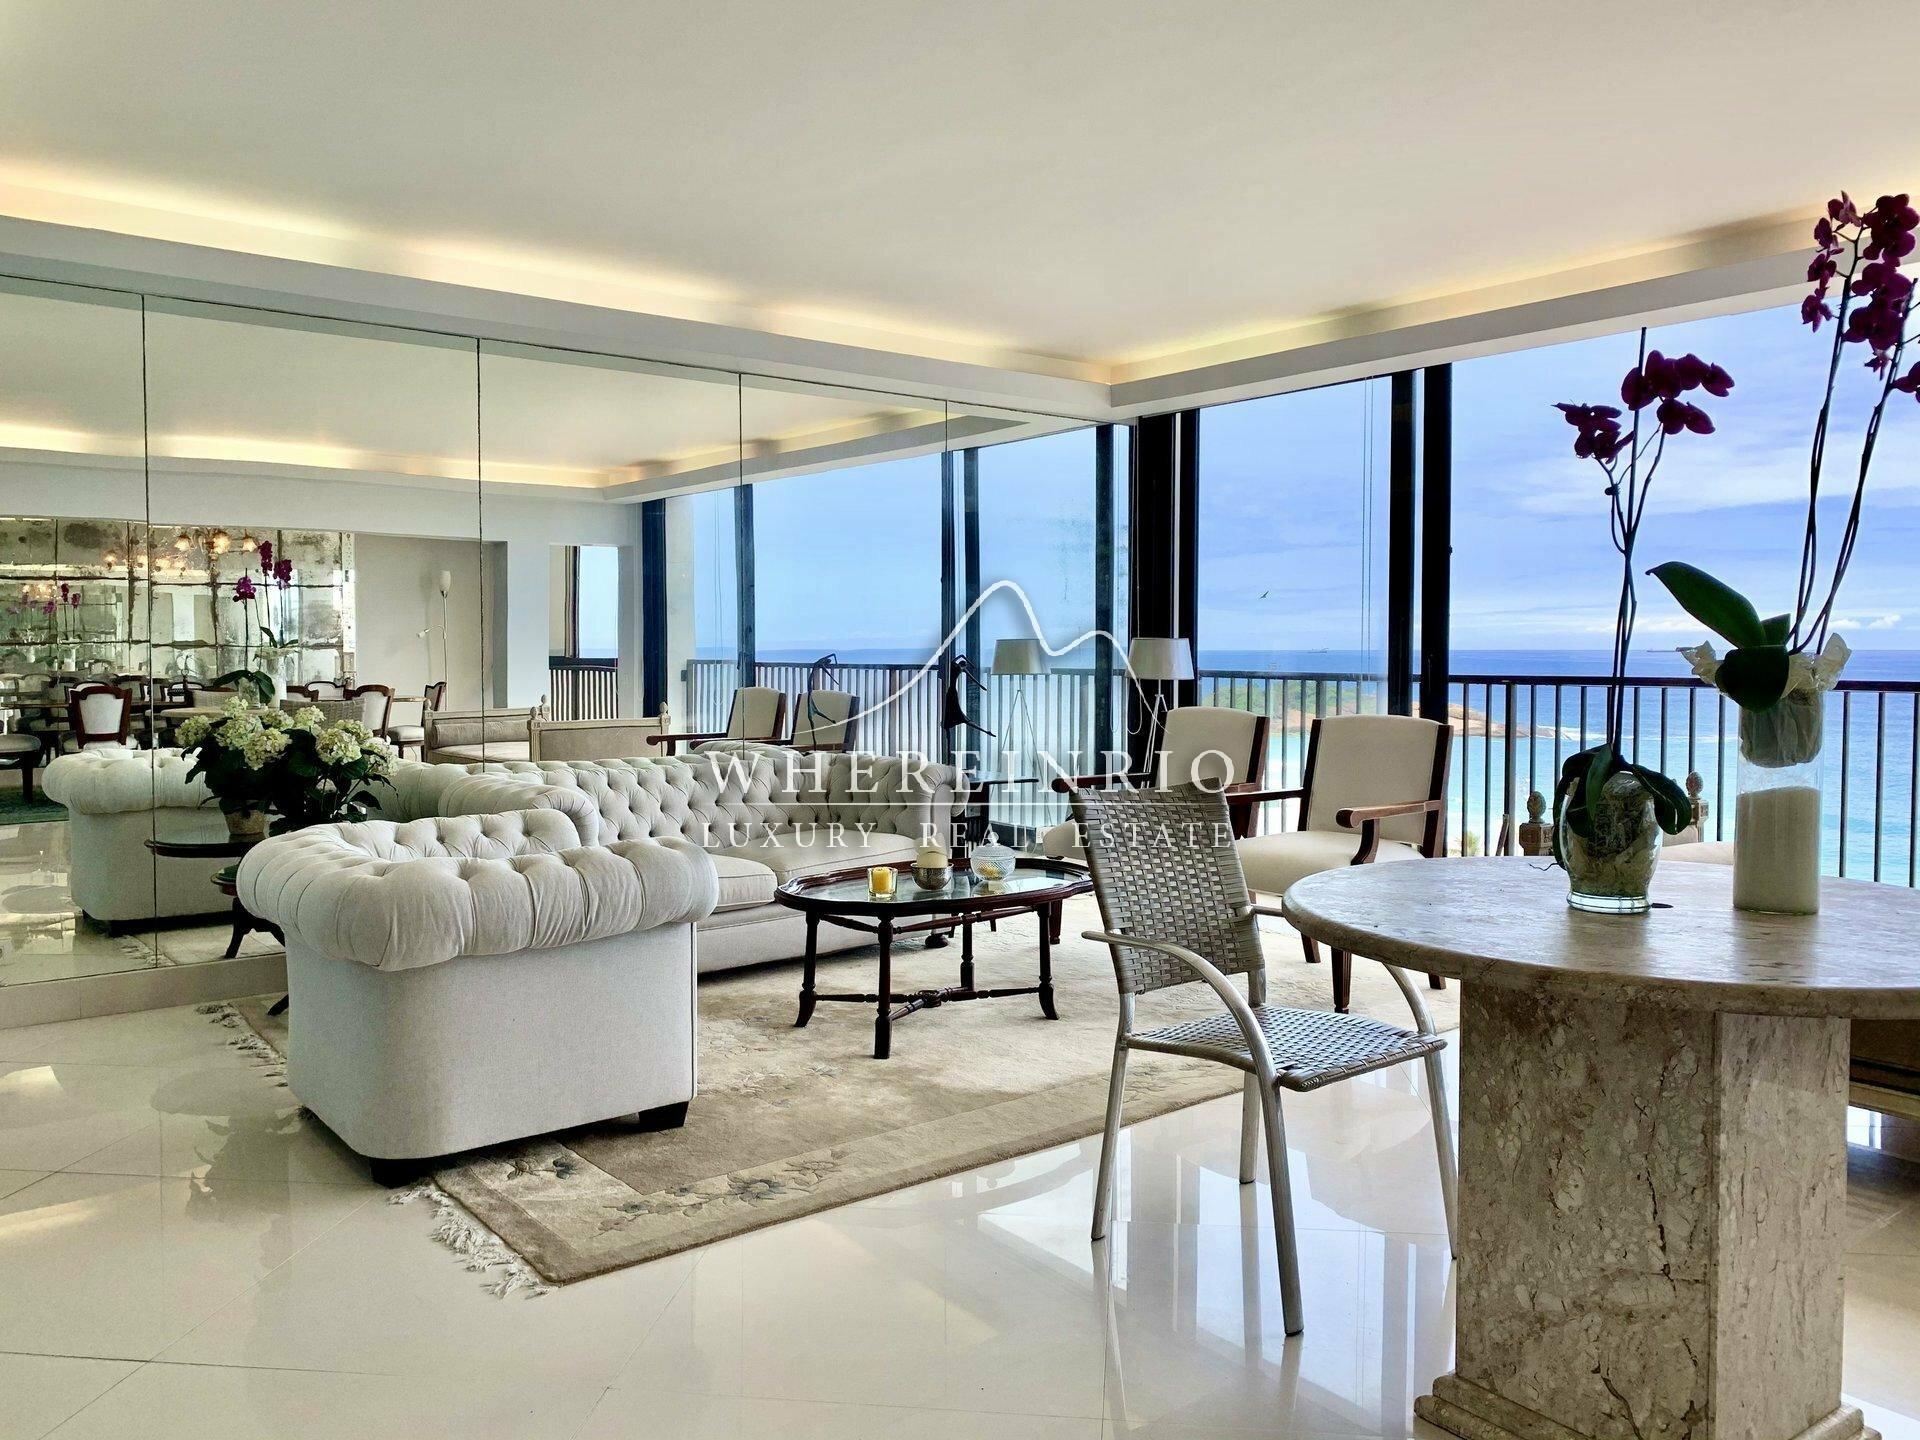 Apartment in Rio de Janeiro, State of Rio de Janeiro, Brazil 1 - 11077825